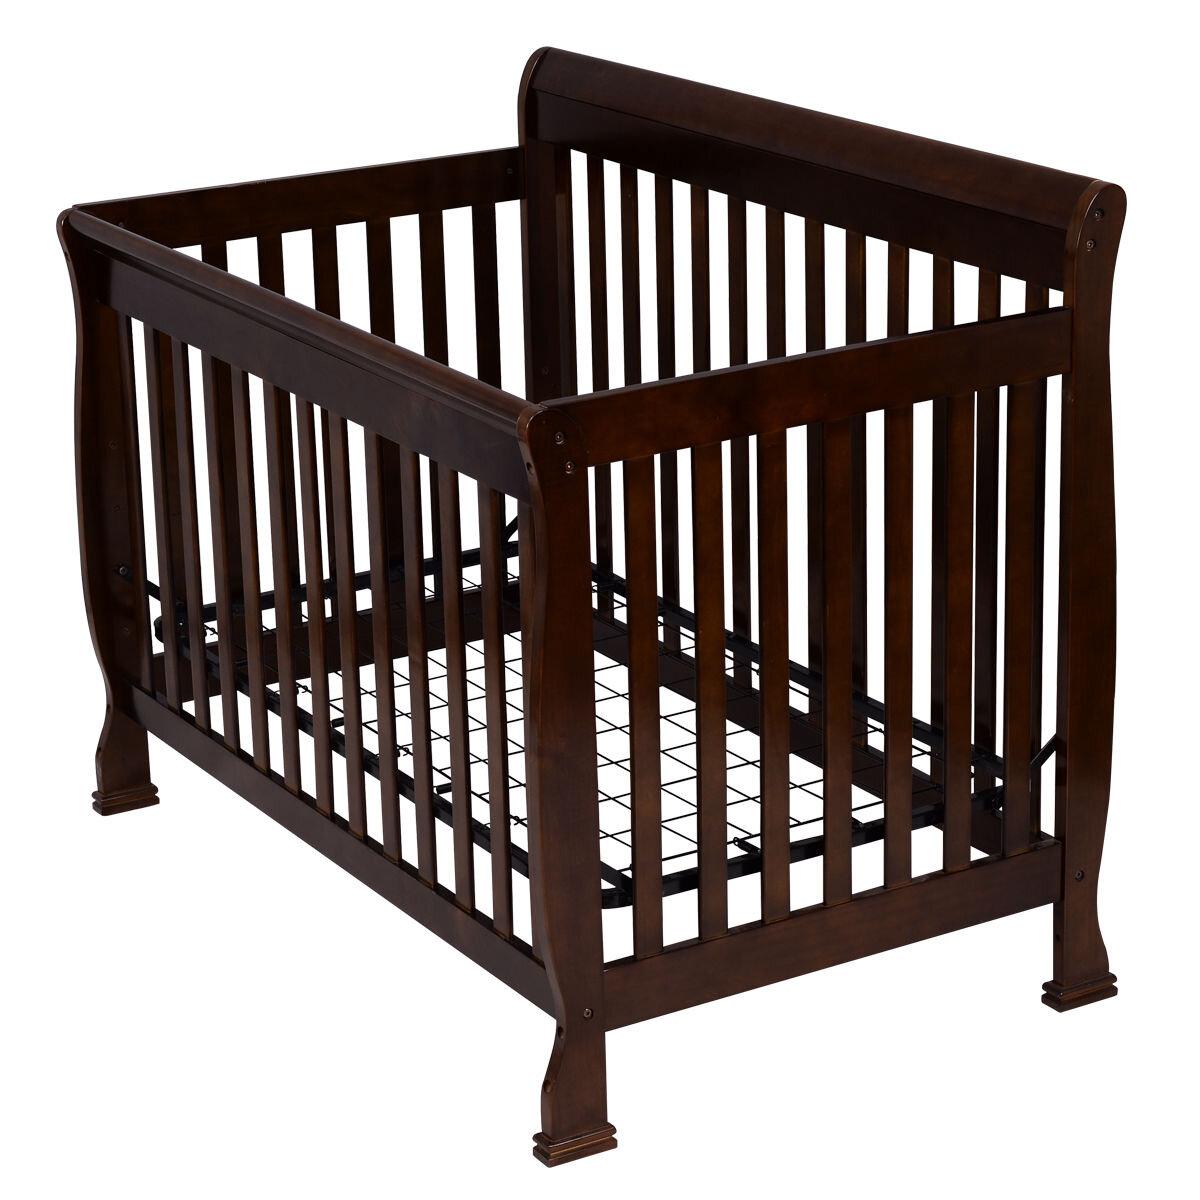 Harriet Bee Coffee Pine Wood Convertible Crib Baby Toddler Bed Wayfair Ca